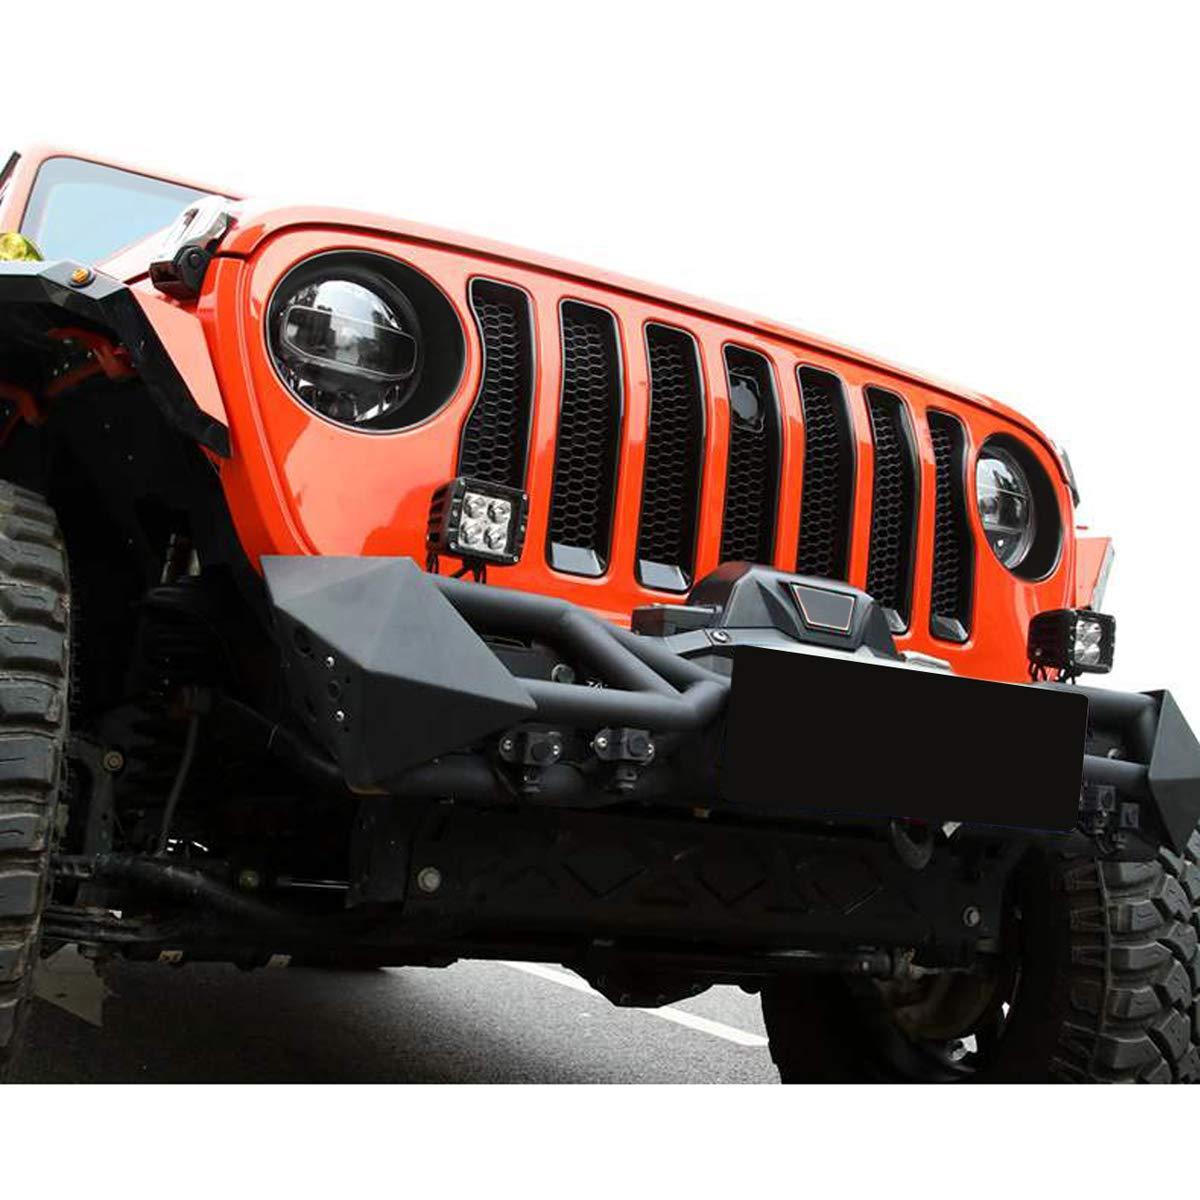 Matte Black American 4wheel Jeep Wrangler Clip-in Bezels Headlight Cover Headlight Trim for Jeep Wrangler Accessories JK JKU /& Unlimited Rubicon Sahara Sports,2007-2018 ABS